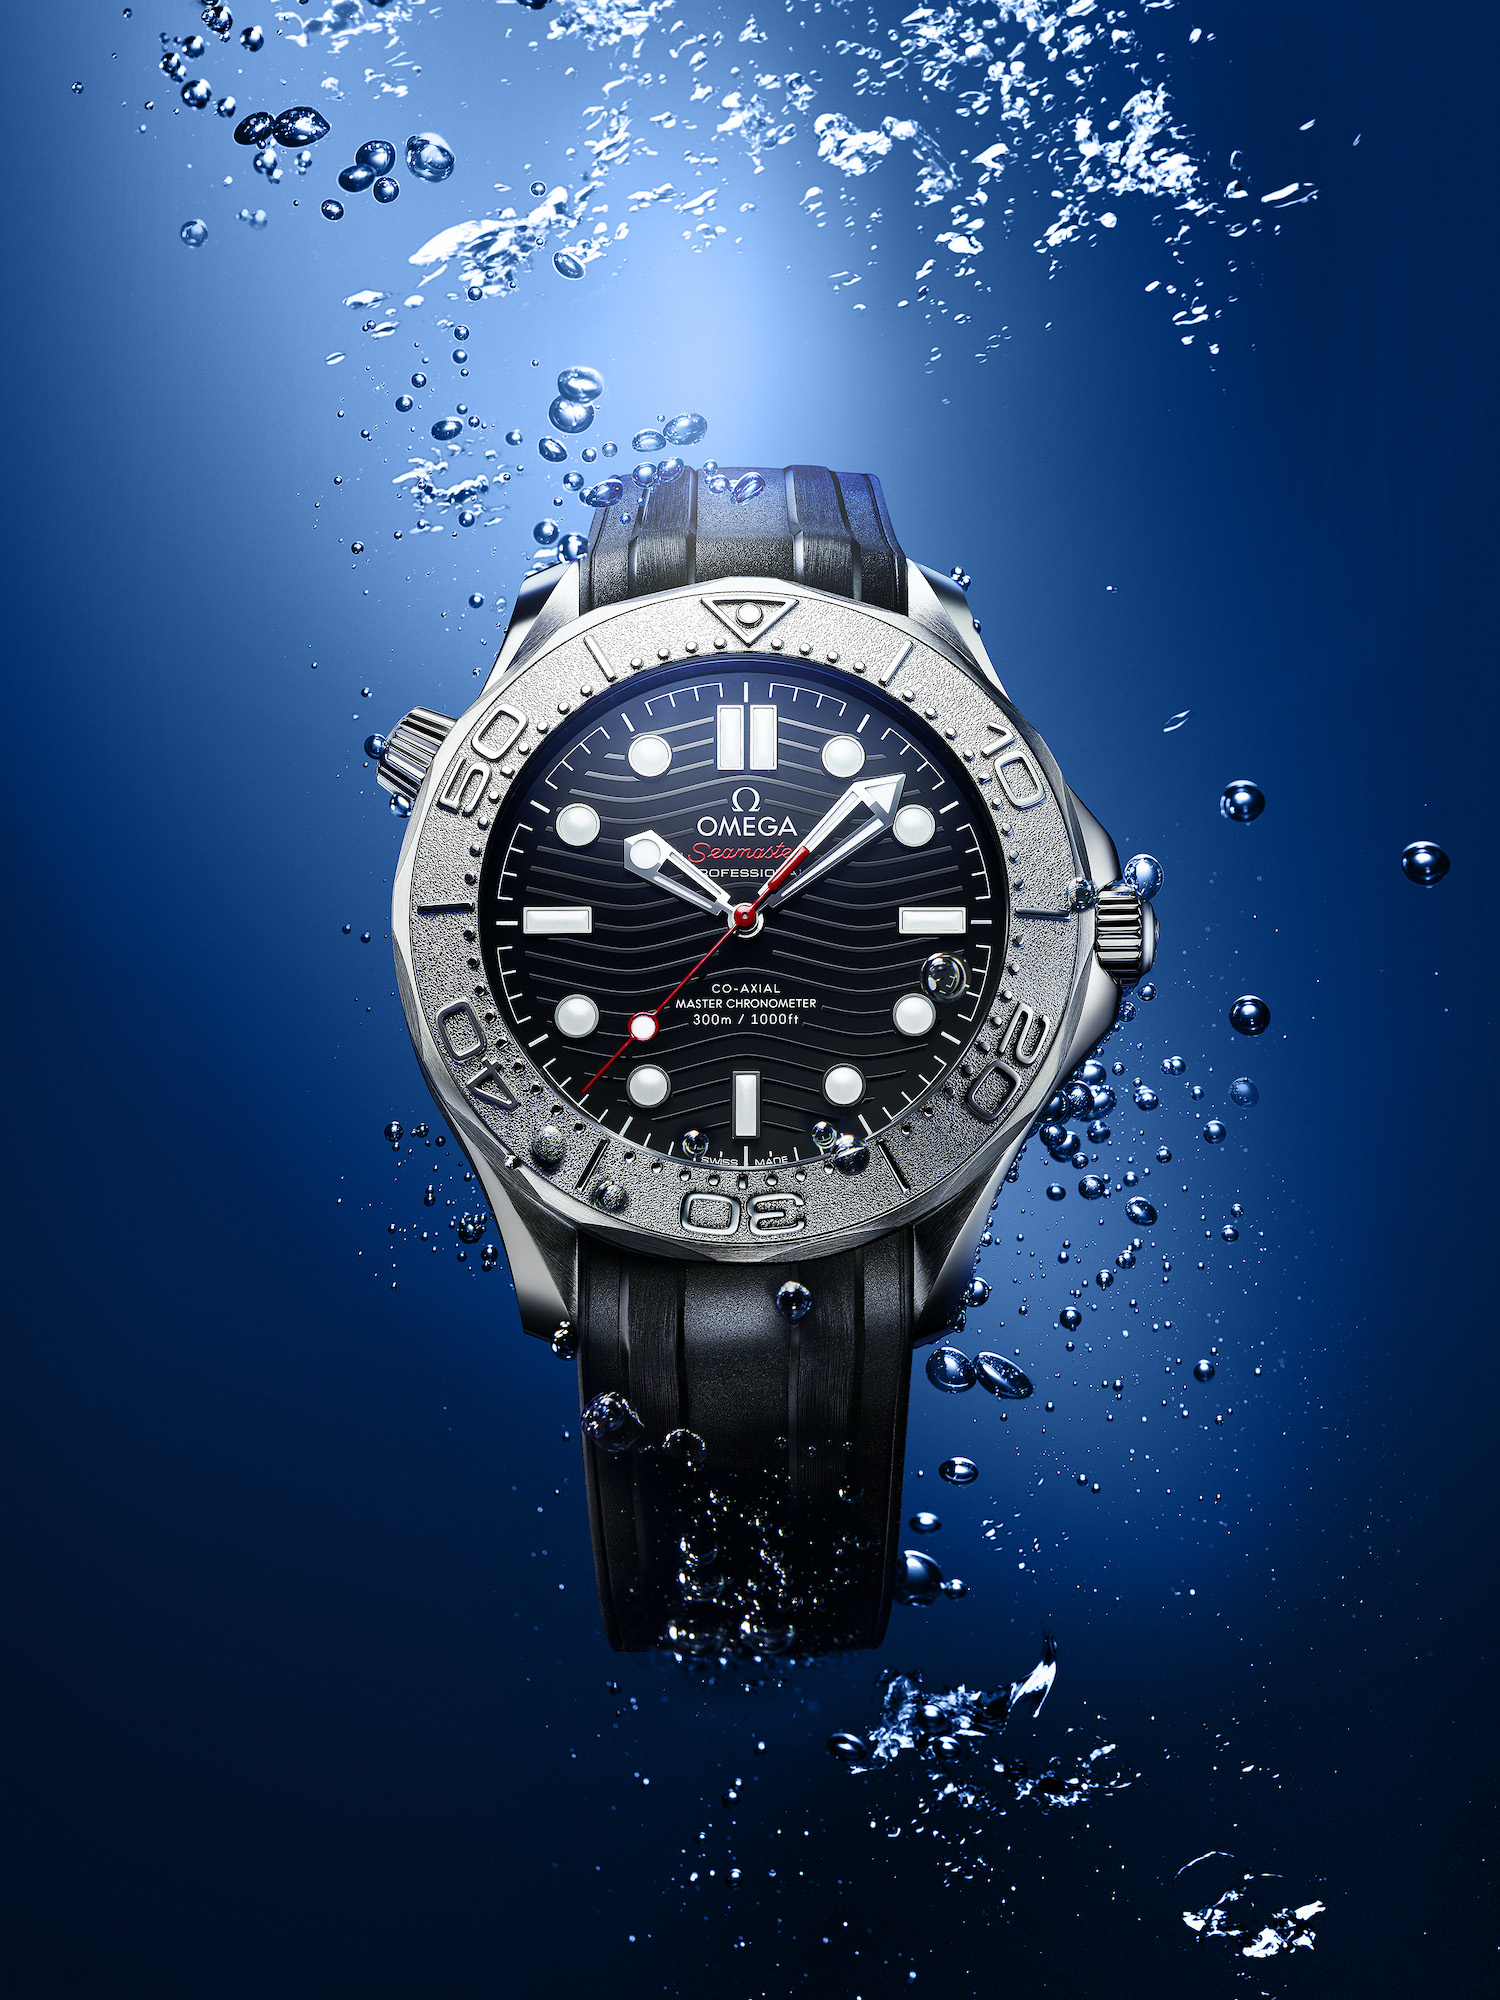 Omega Seamaster Diver 300M Nekton Edition 210.32.42.20.01.002 lifestyle 2